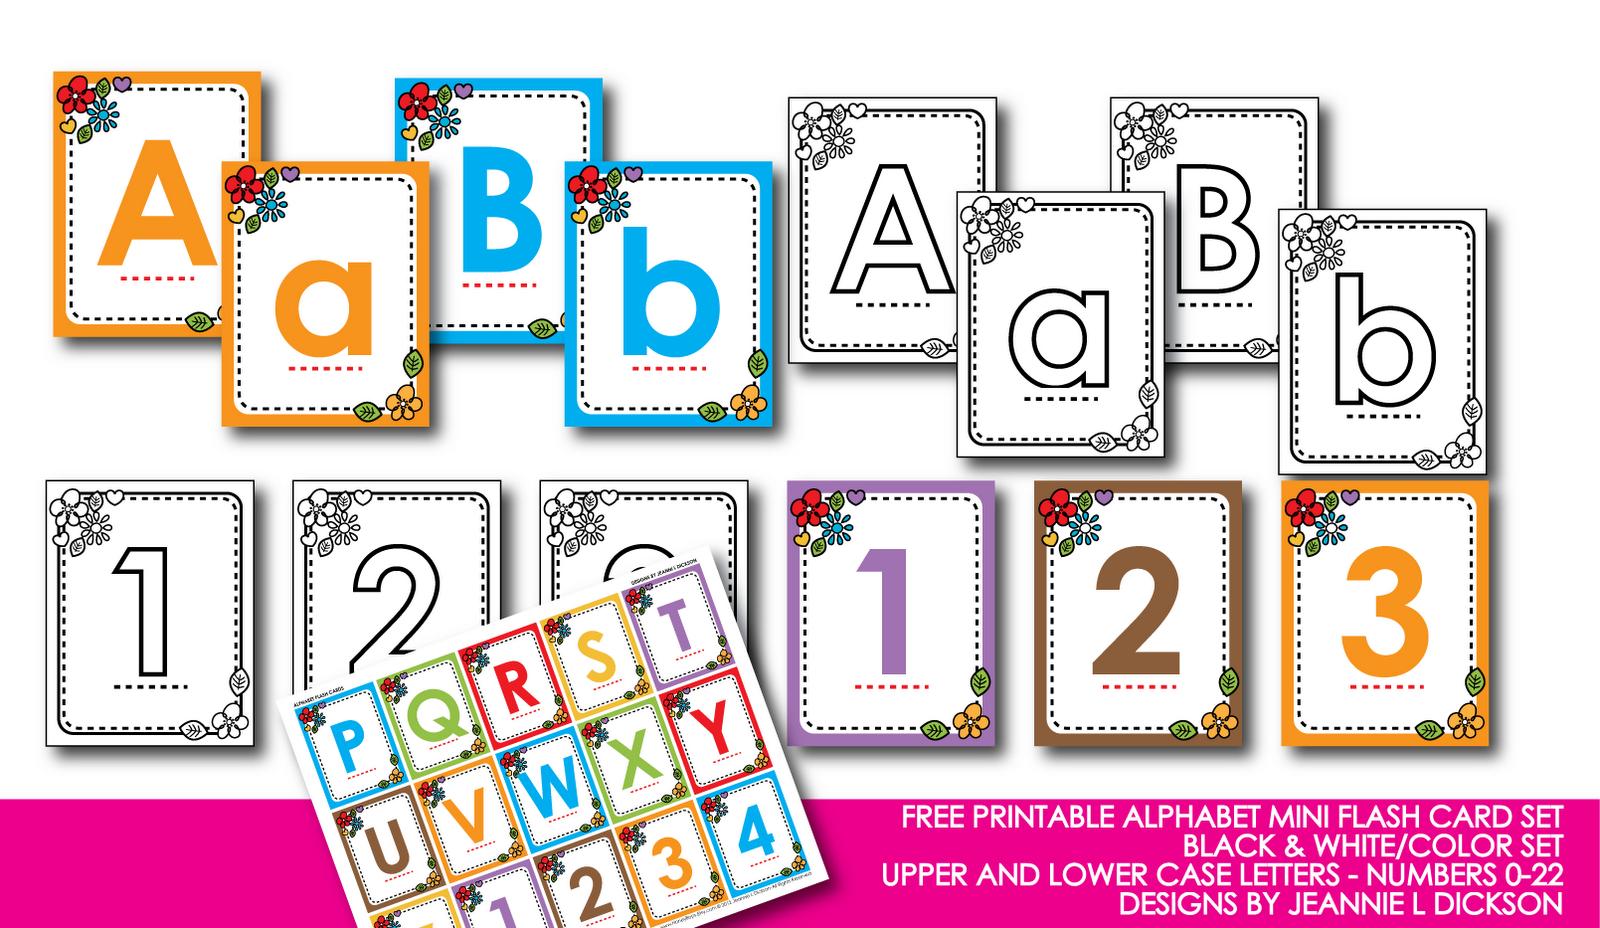 Kindergarten Alphabet Cards | Free Printable Alphabet Mini Flash - Free Printable Lower Case Letters Flashcards